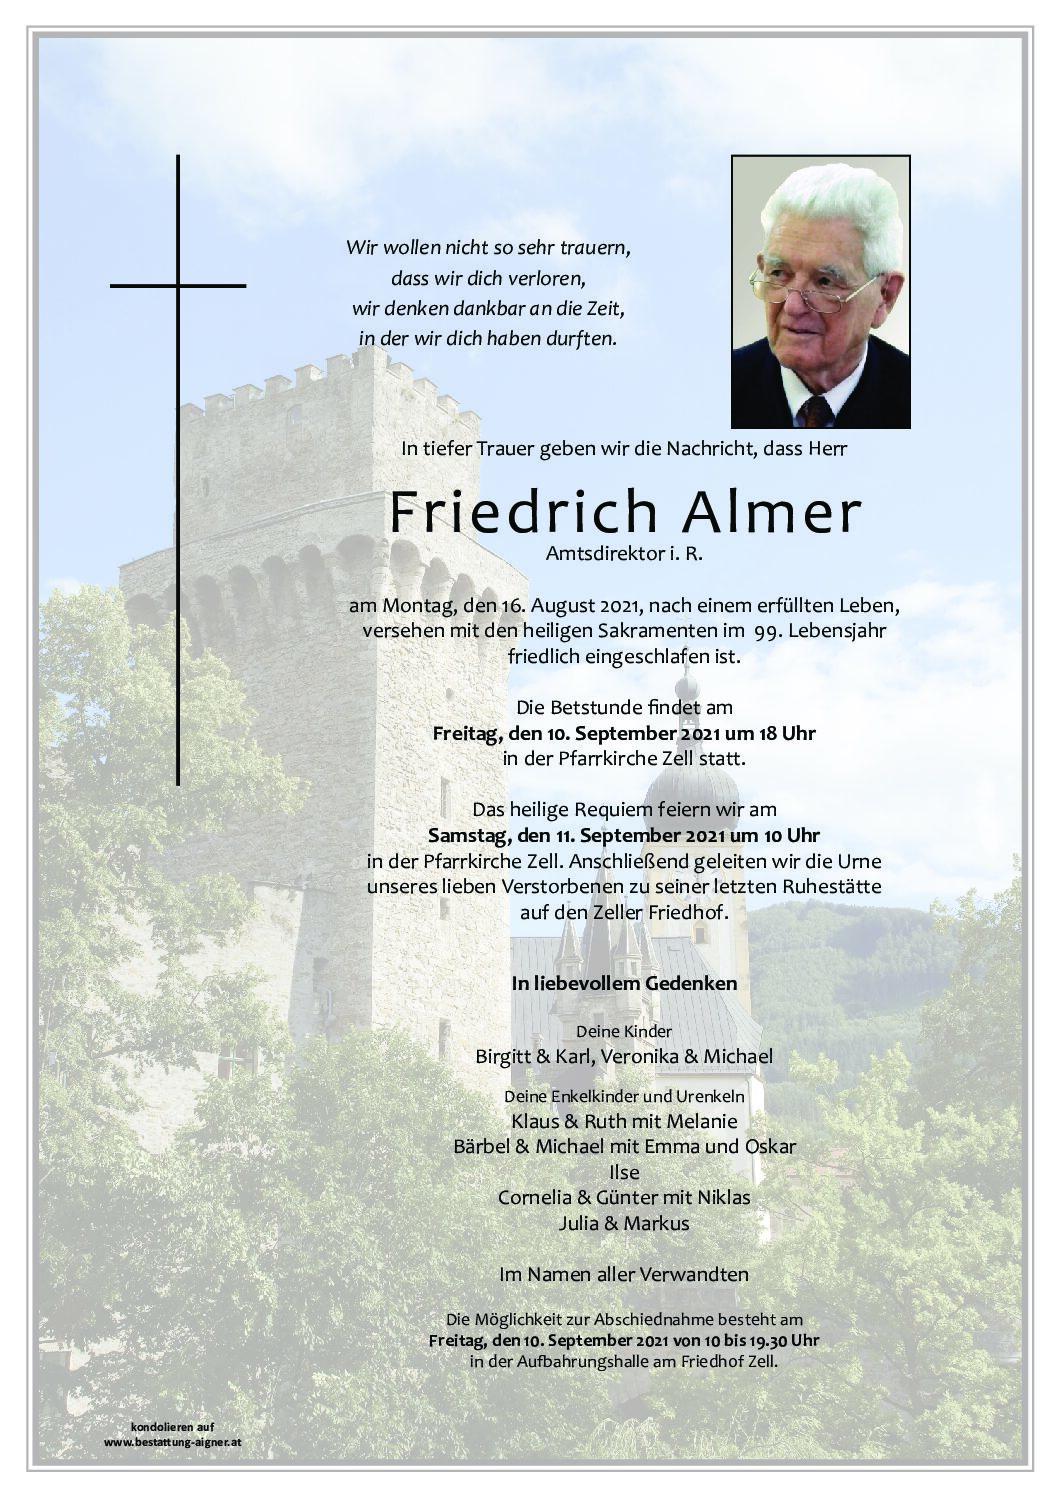 Friedrich Almer